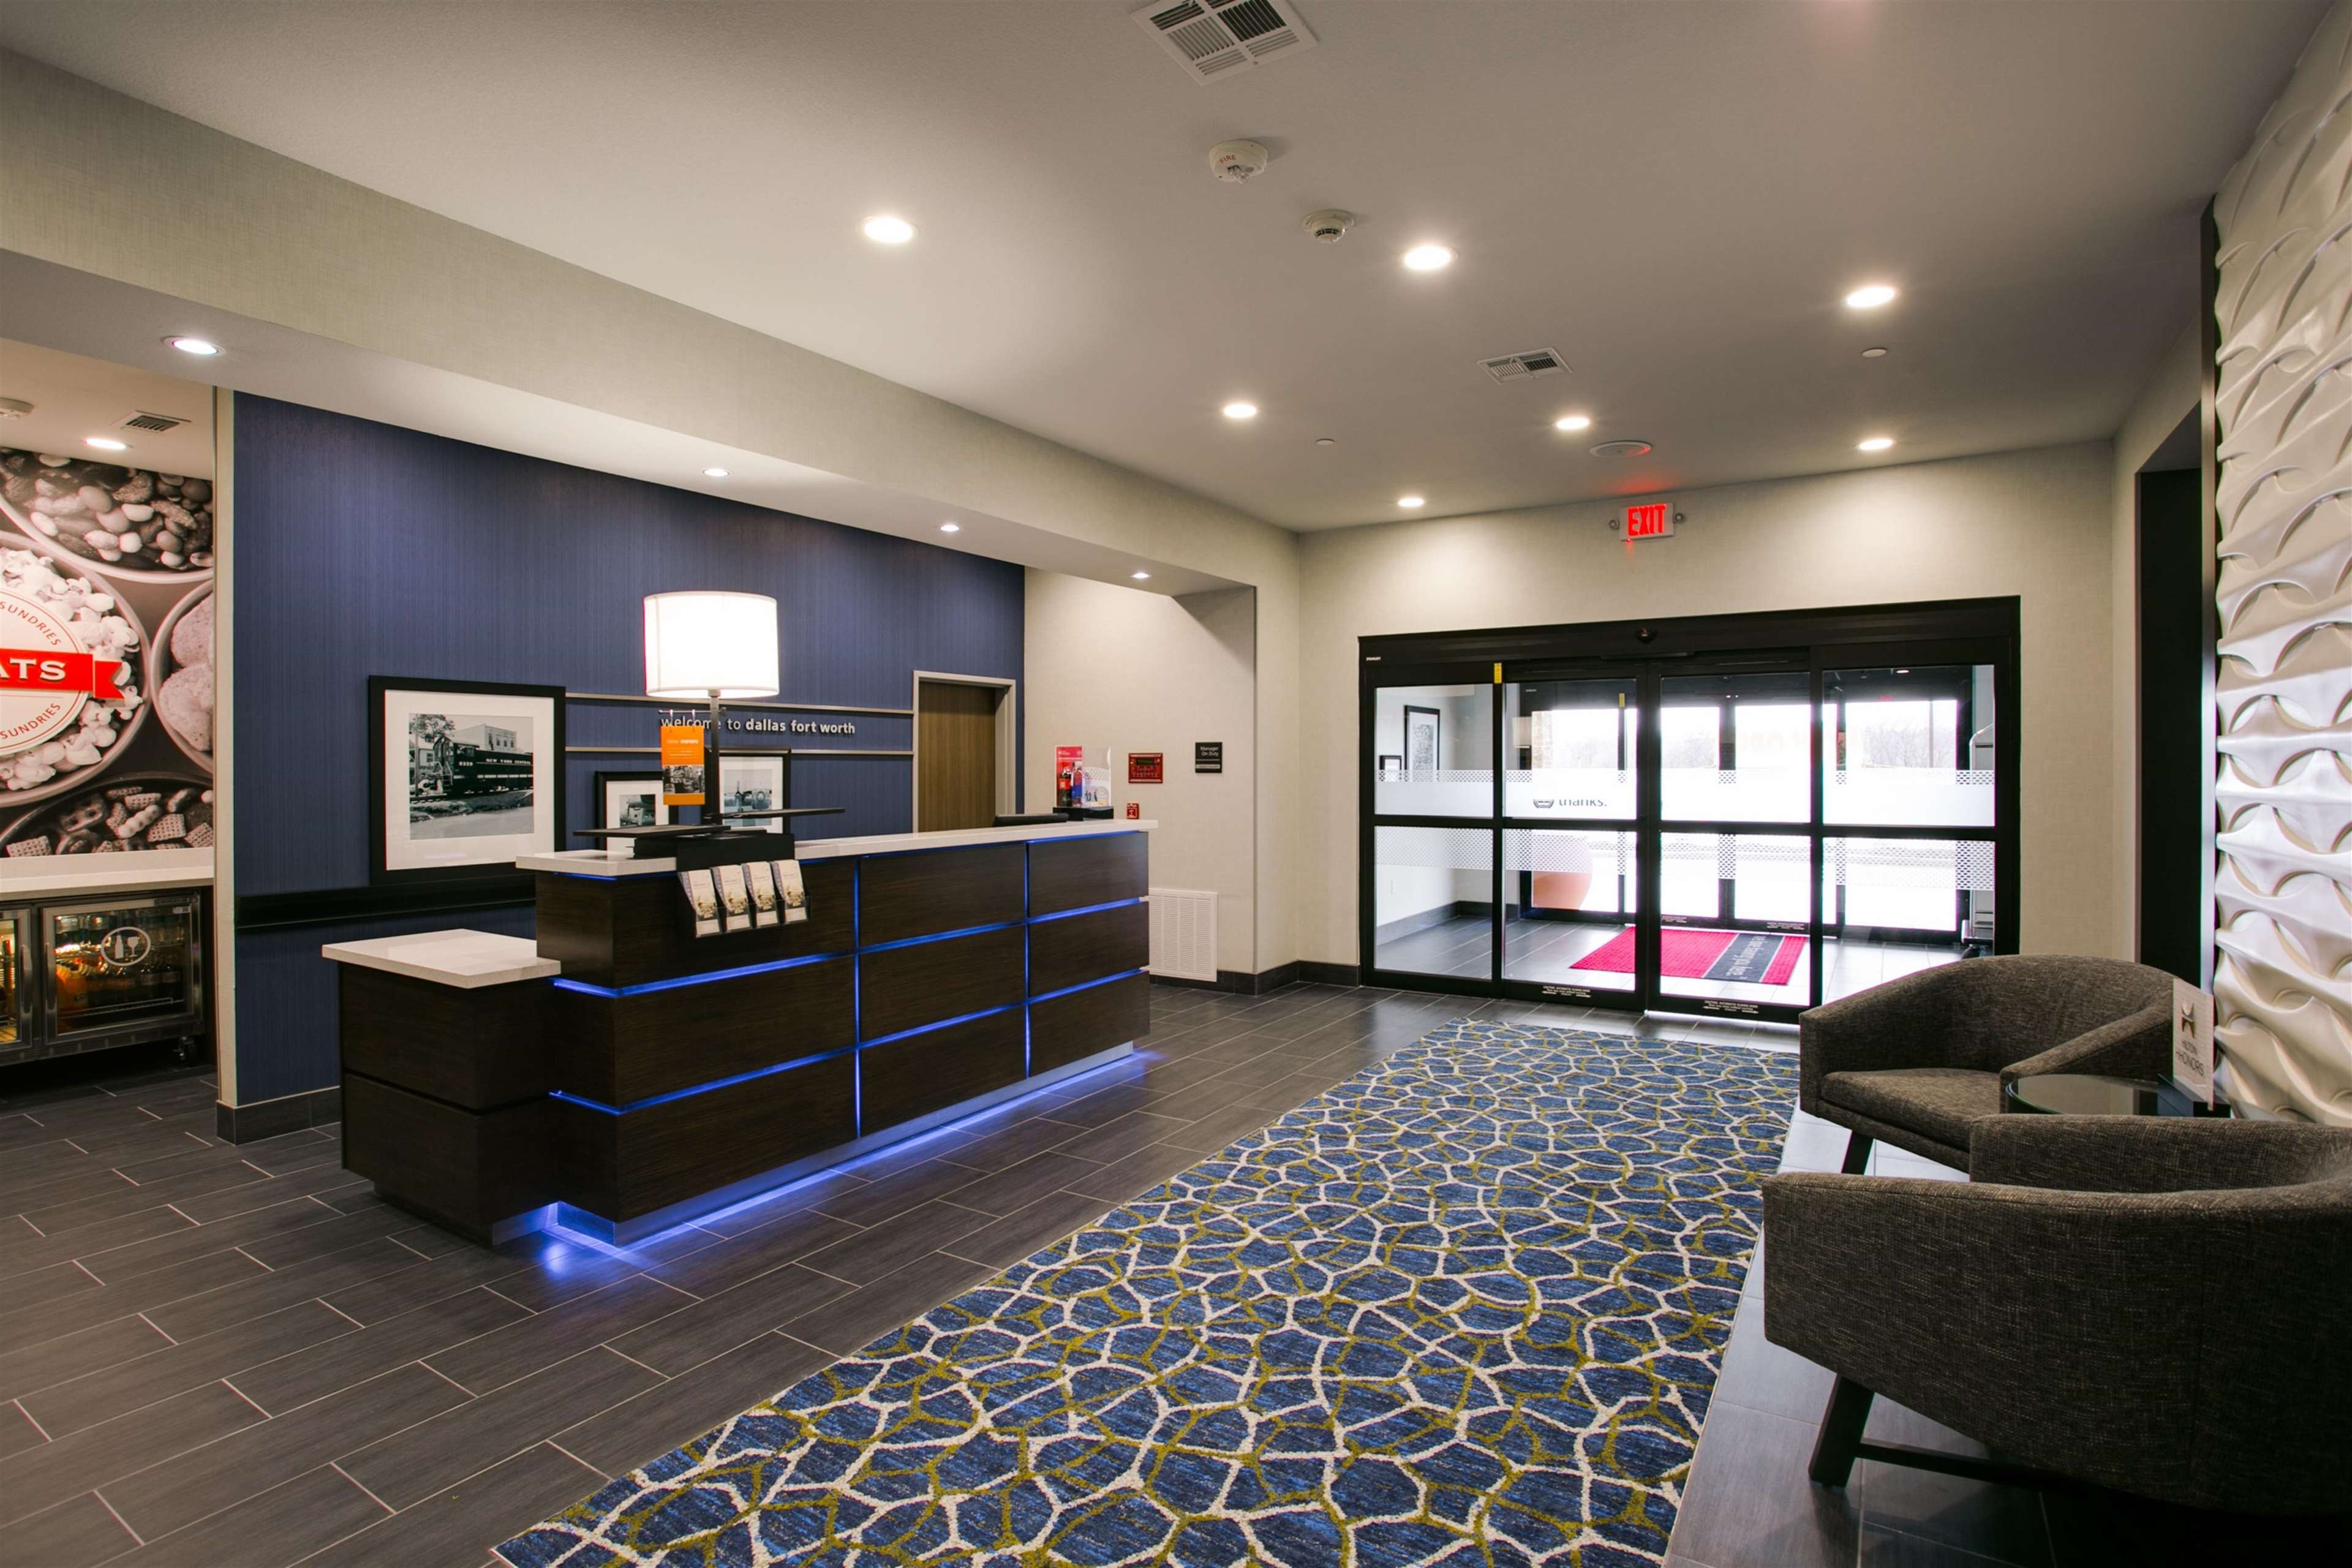 Hampton Inn & Suites Dallas/Ft. Worth Airport South image 4